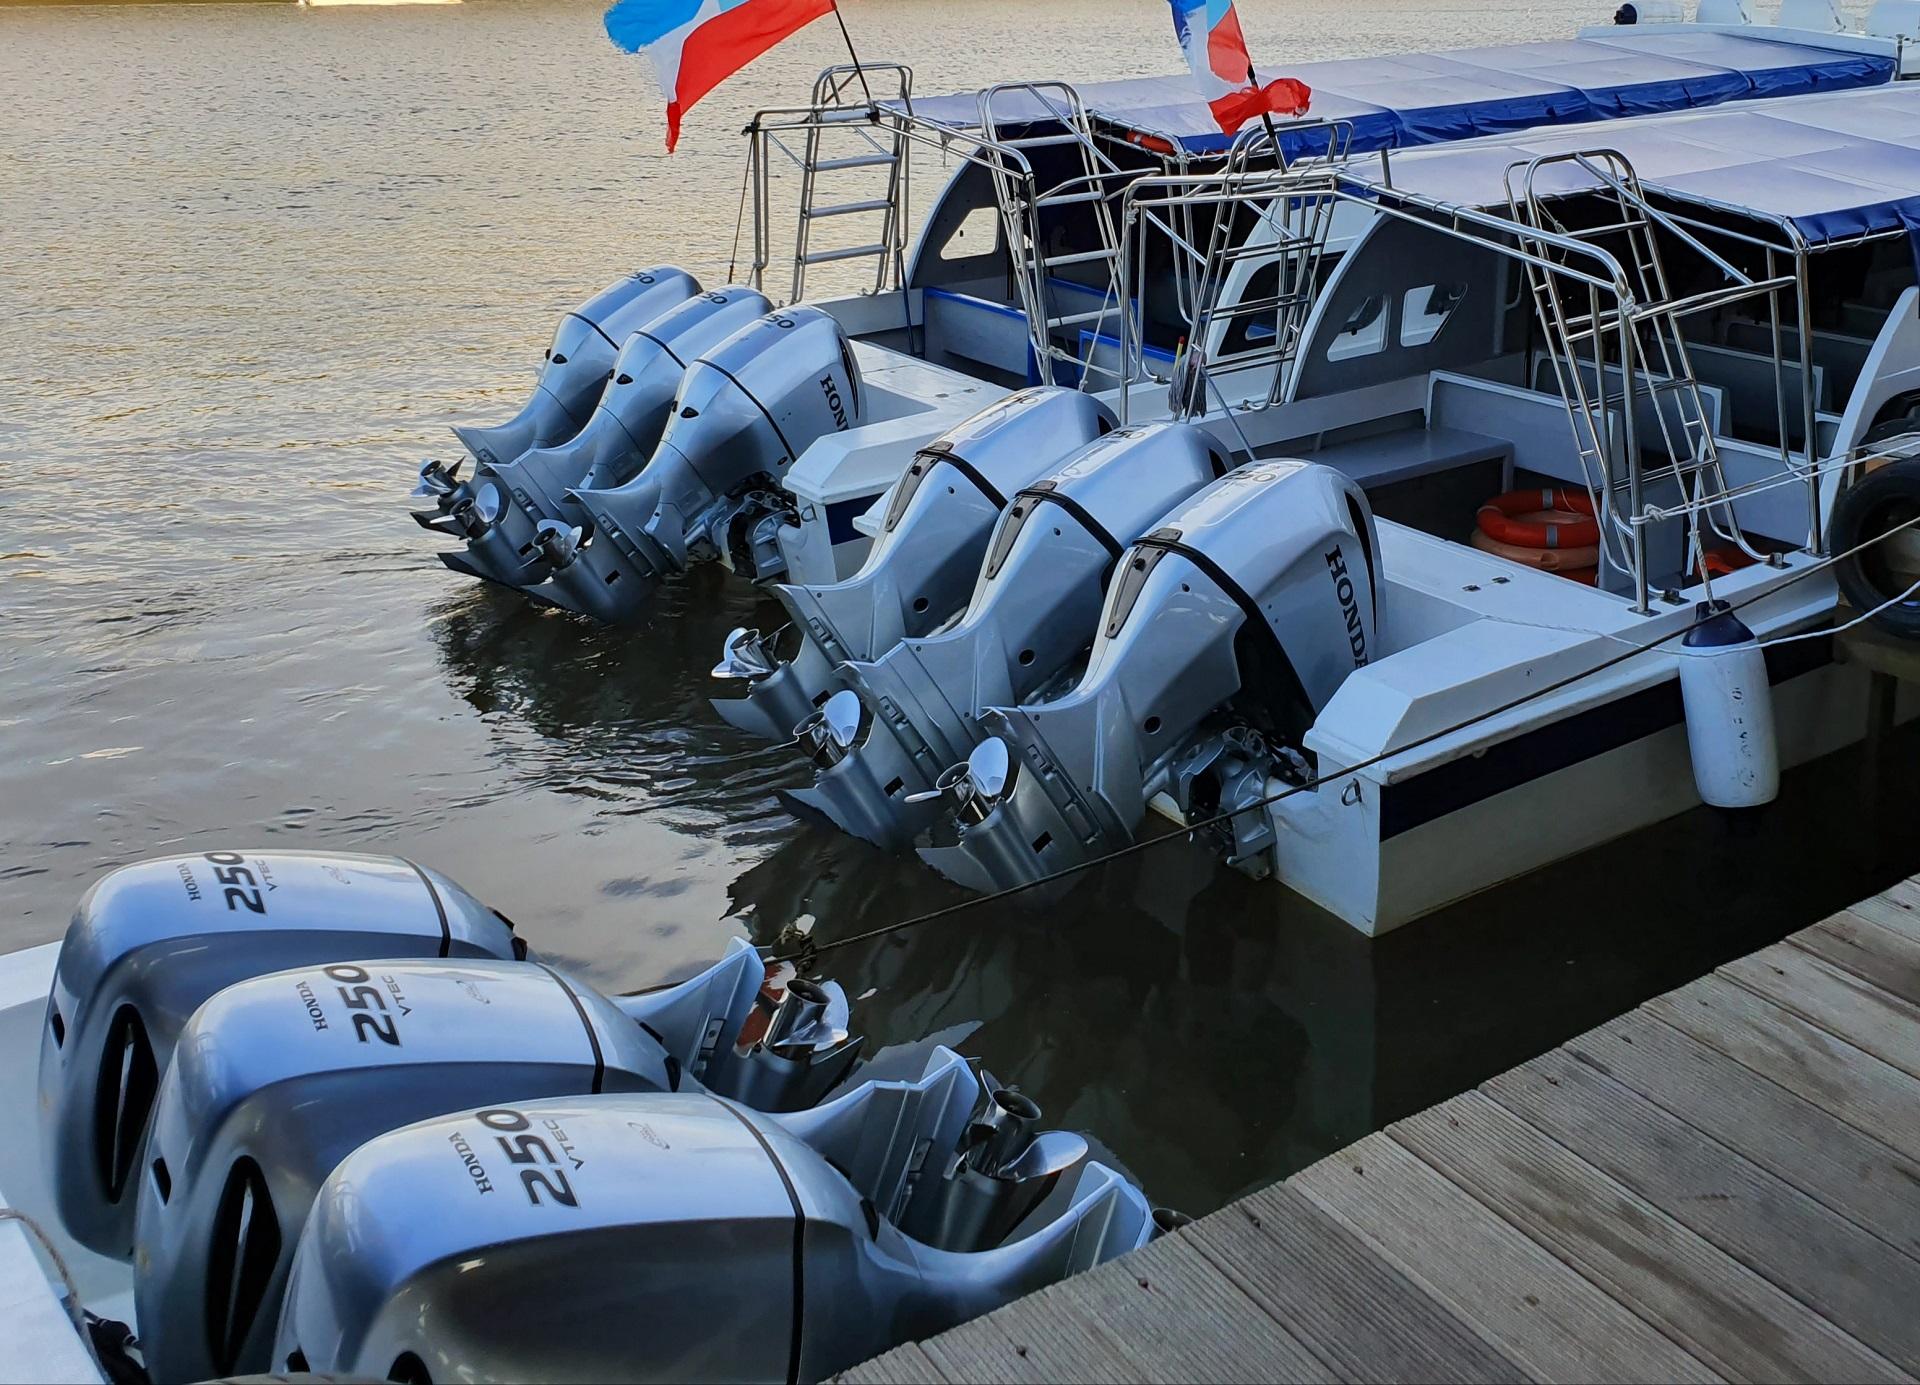 Victormax Honda Marine Engines